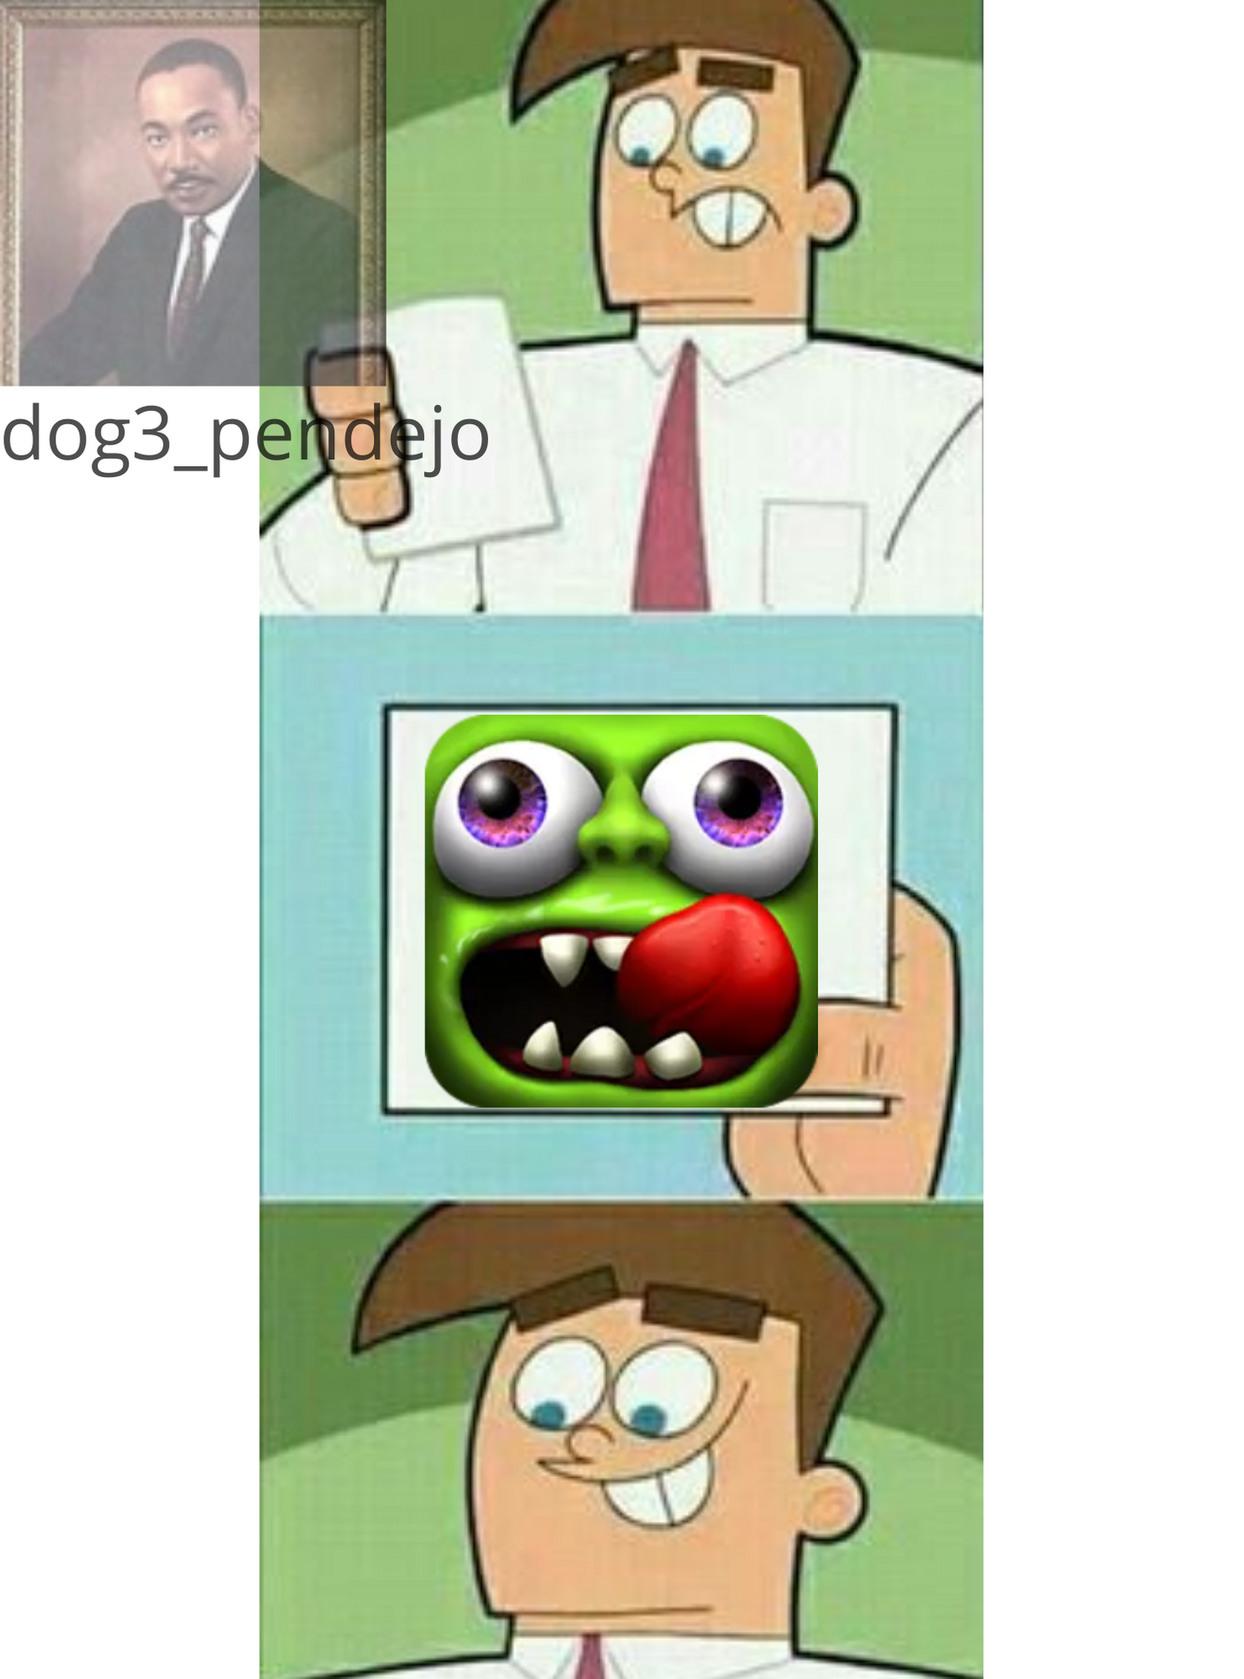 la ostalgia - meme